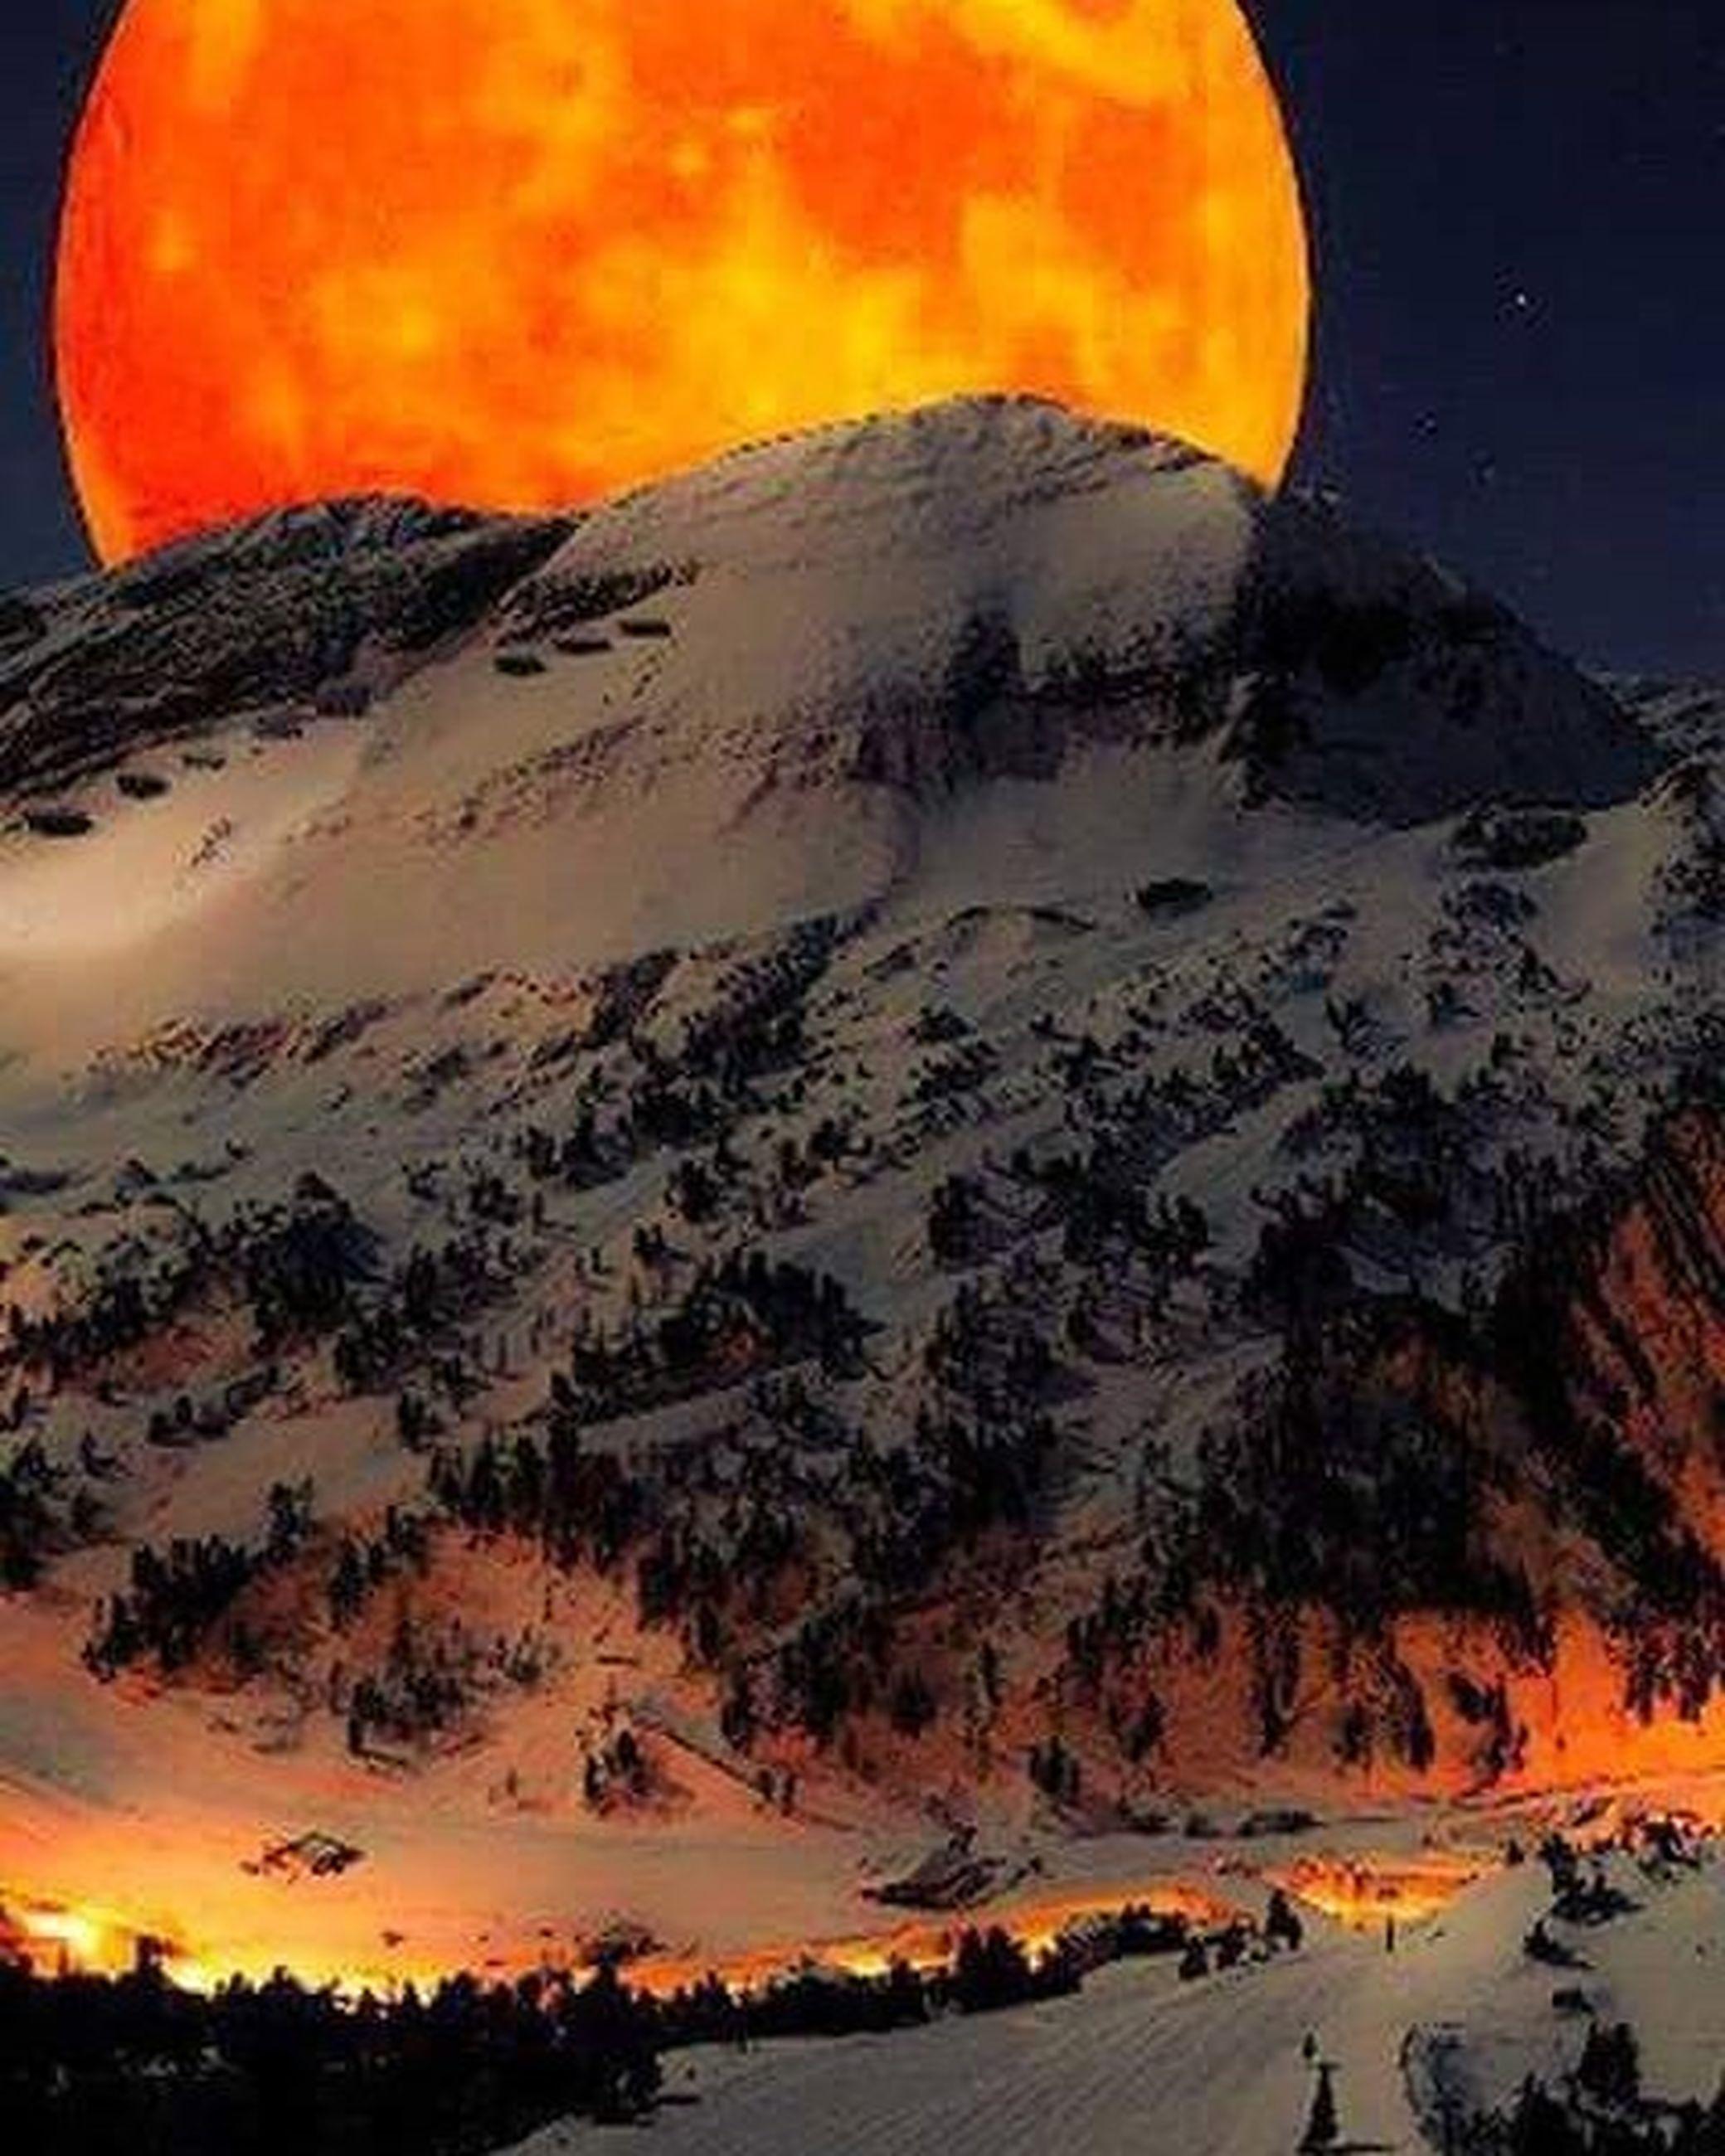 sunset, orange color, scenics, tranquil scene, tranquility, beauty in nature, mountain, sky, nature, idyllic, landscape, season, winter, non-urban scene, snow, outdoors, majestic, mountain range, cold temperature, dusk